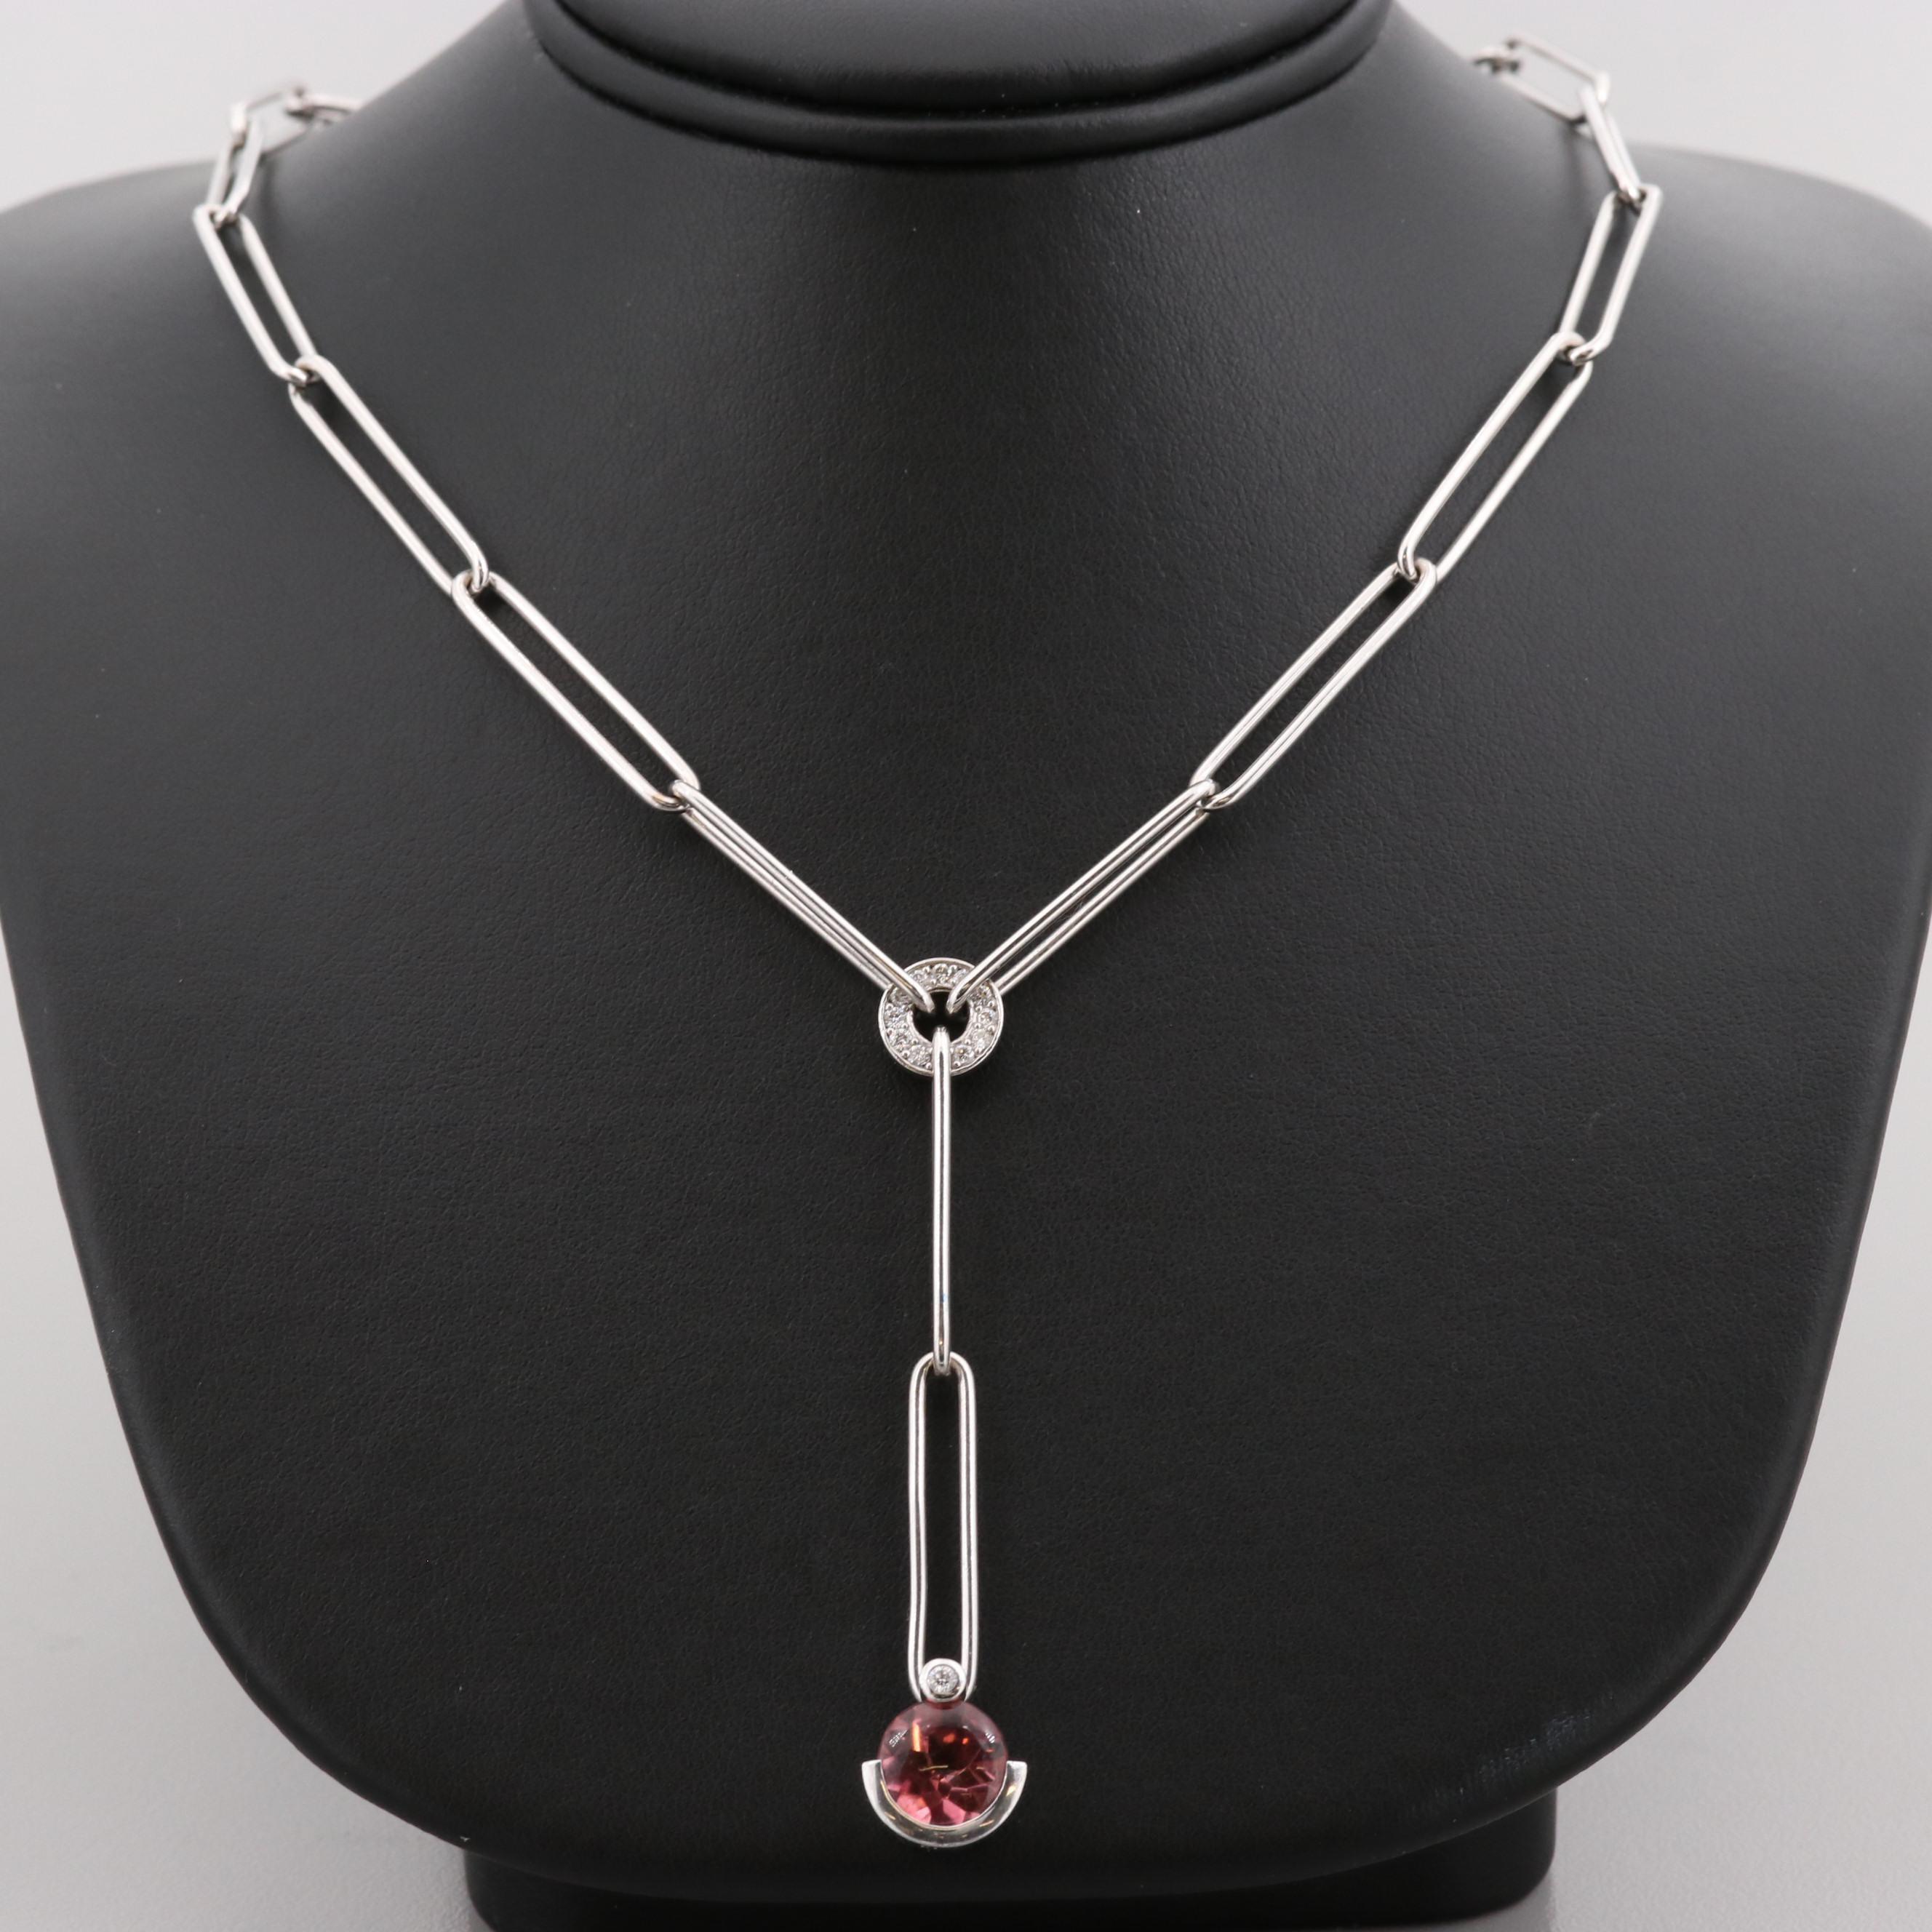 18K White Gold Pink Tourmaline and Diamond Necklace